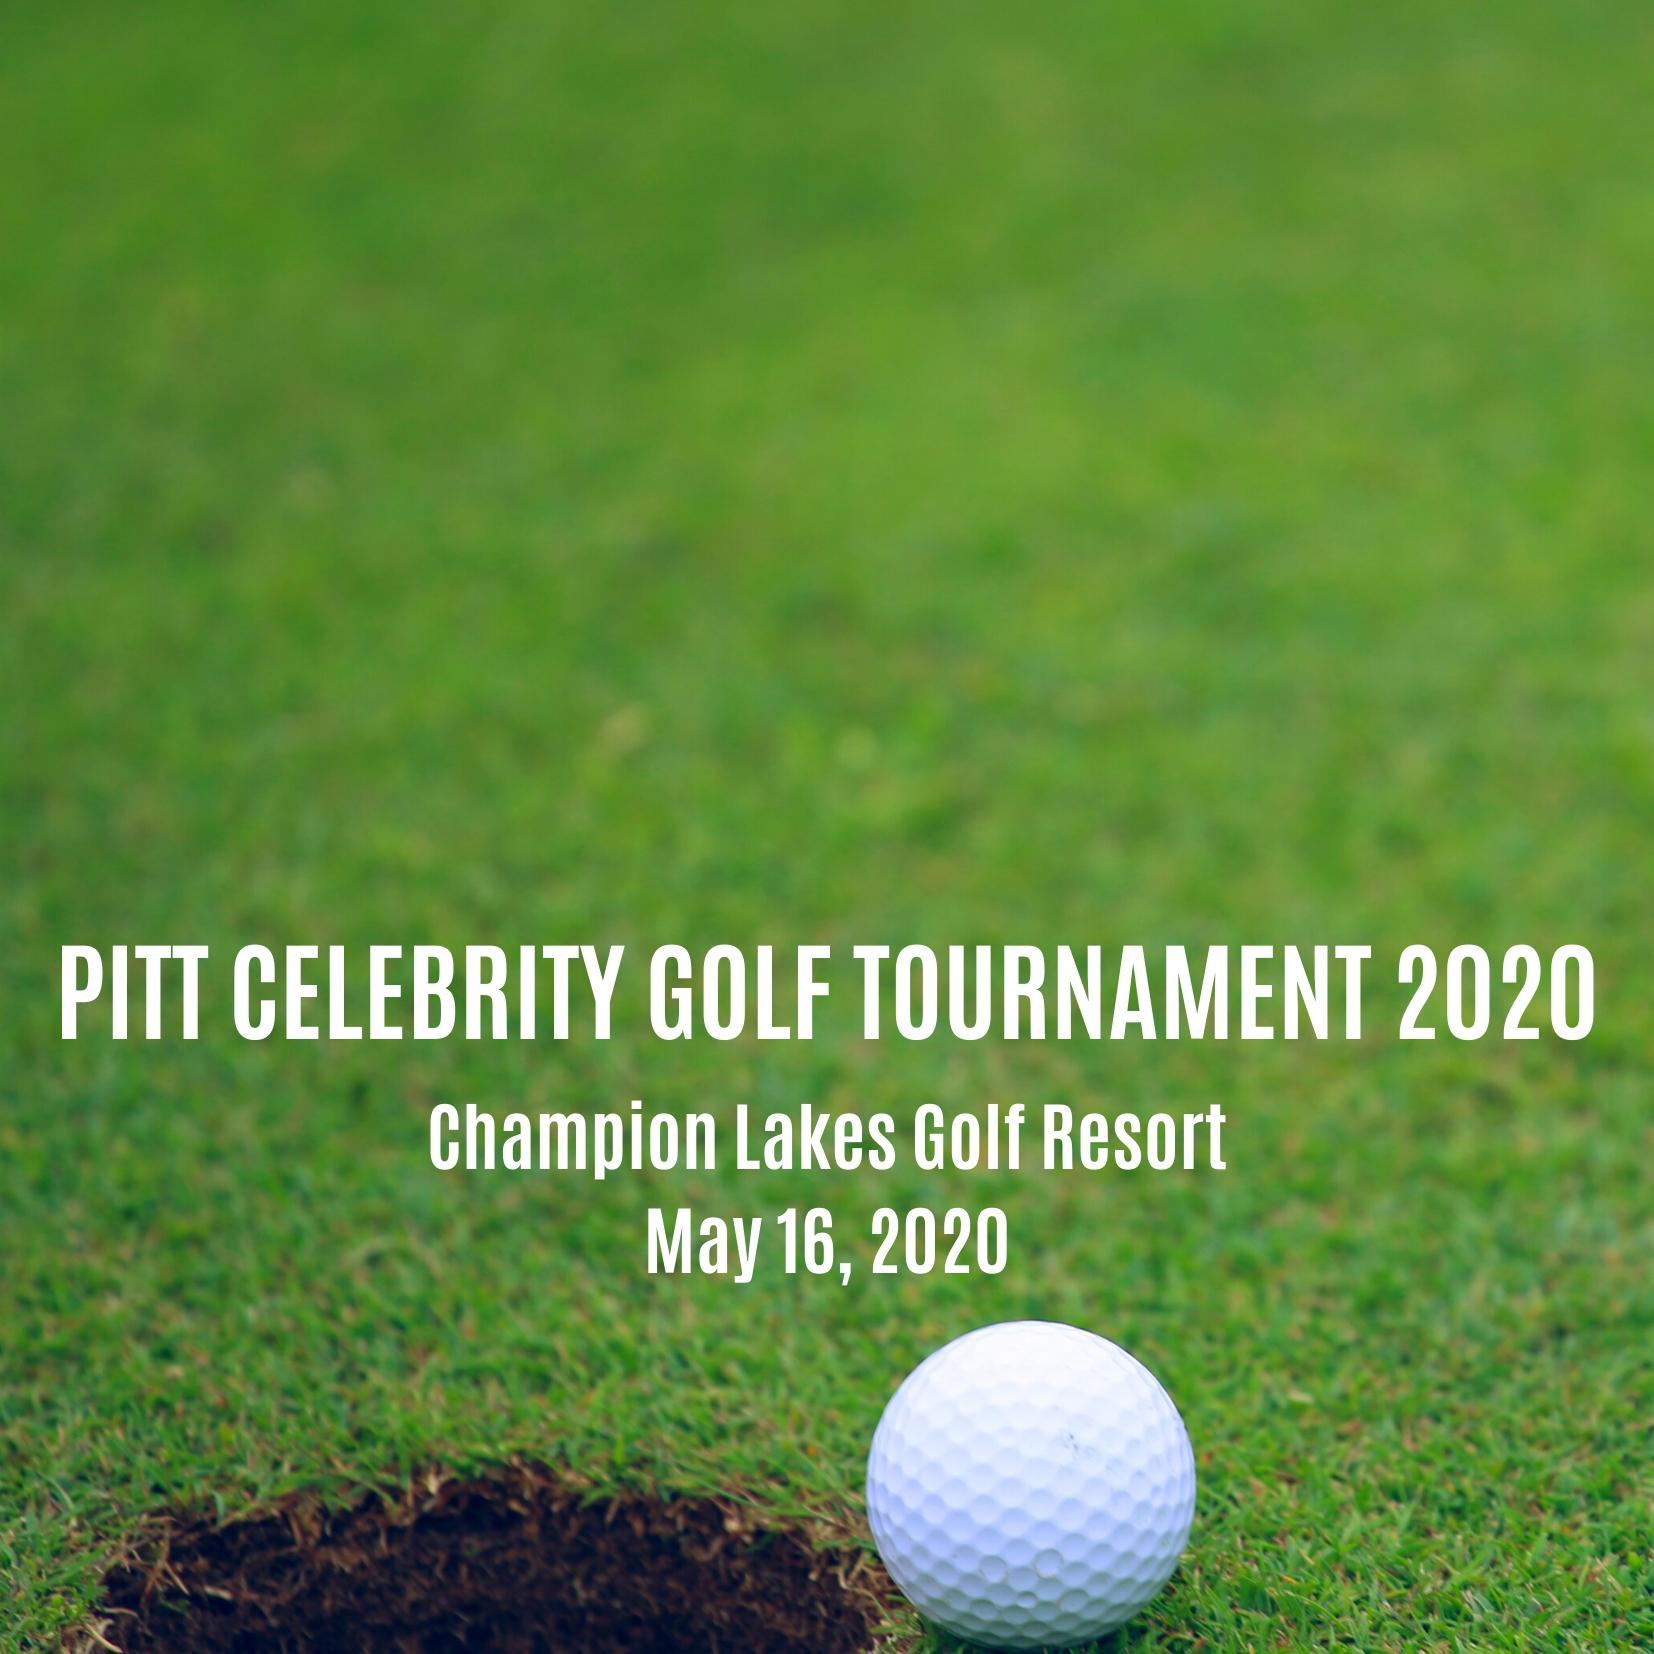 Pitt Celebrity Alumni Golf Tournament 2020